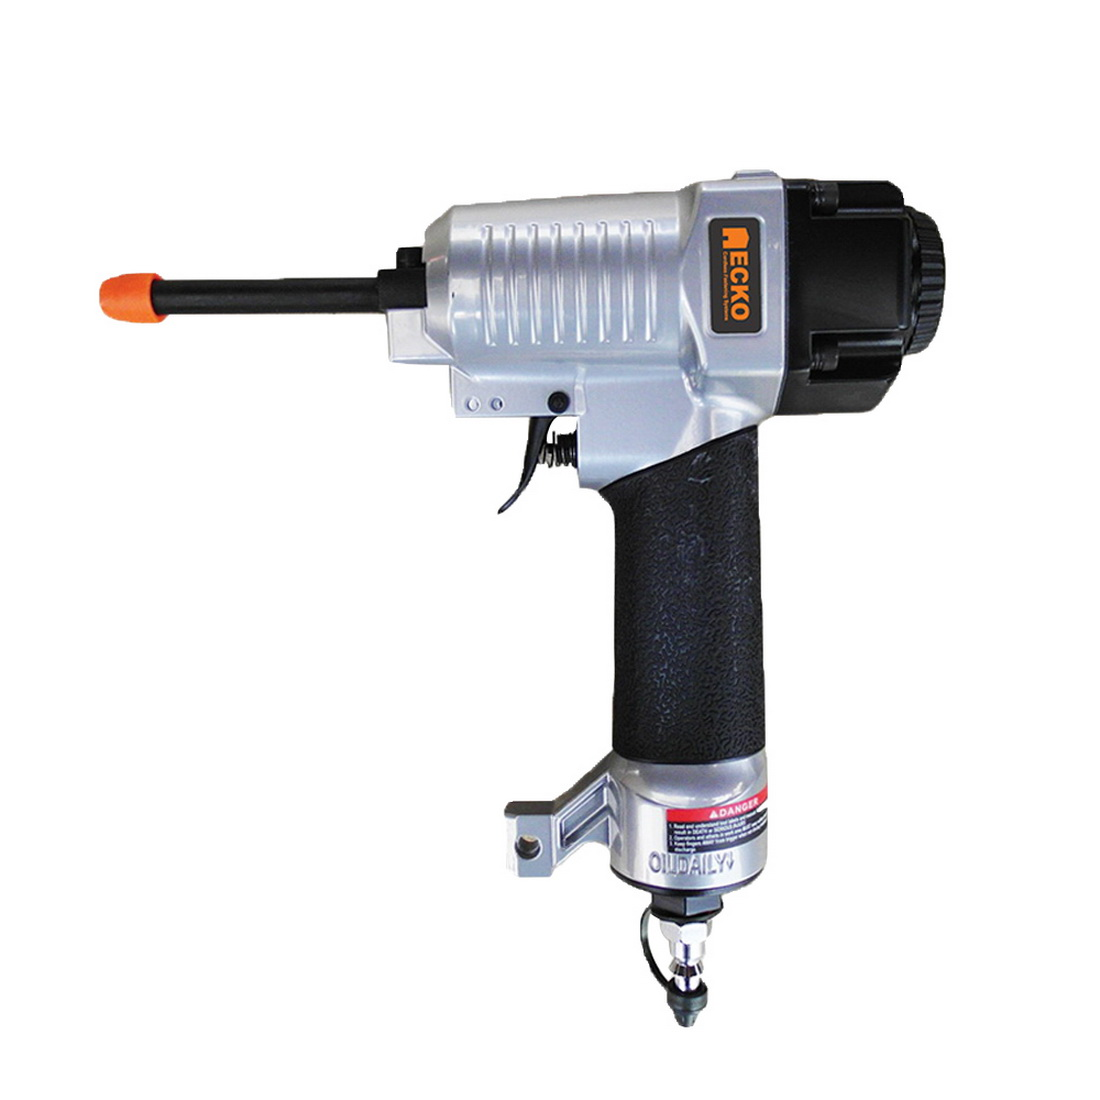 HAMMAHAND Construction Series AirPunch Pneumatic Tool 59-90mm Magnesium EC-P90